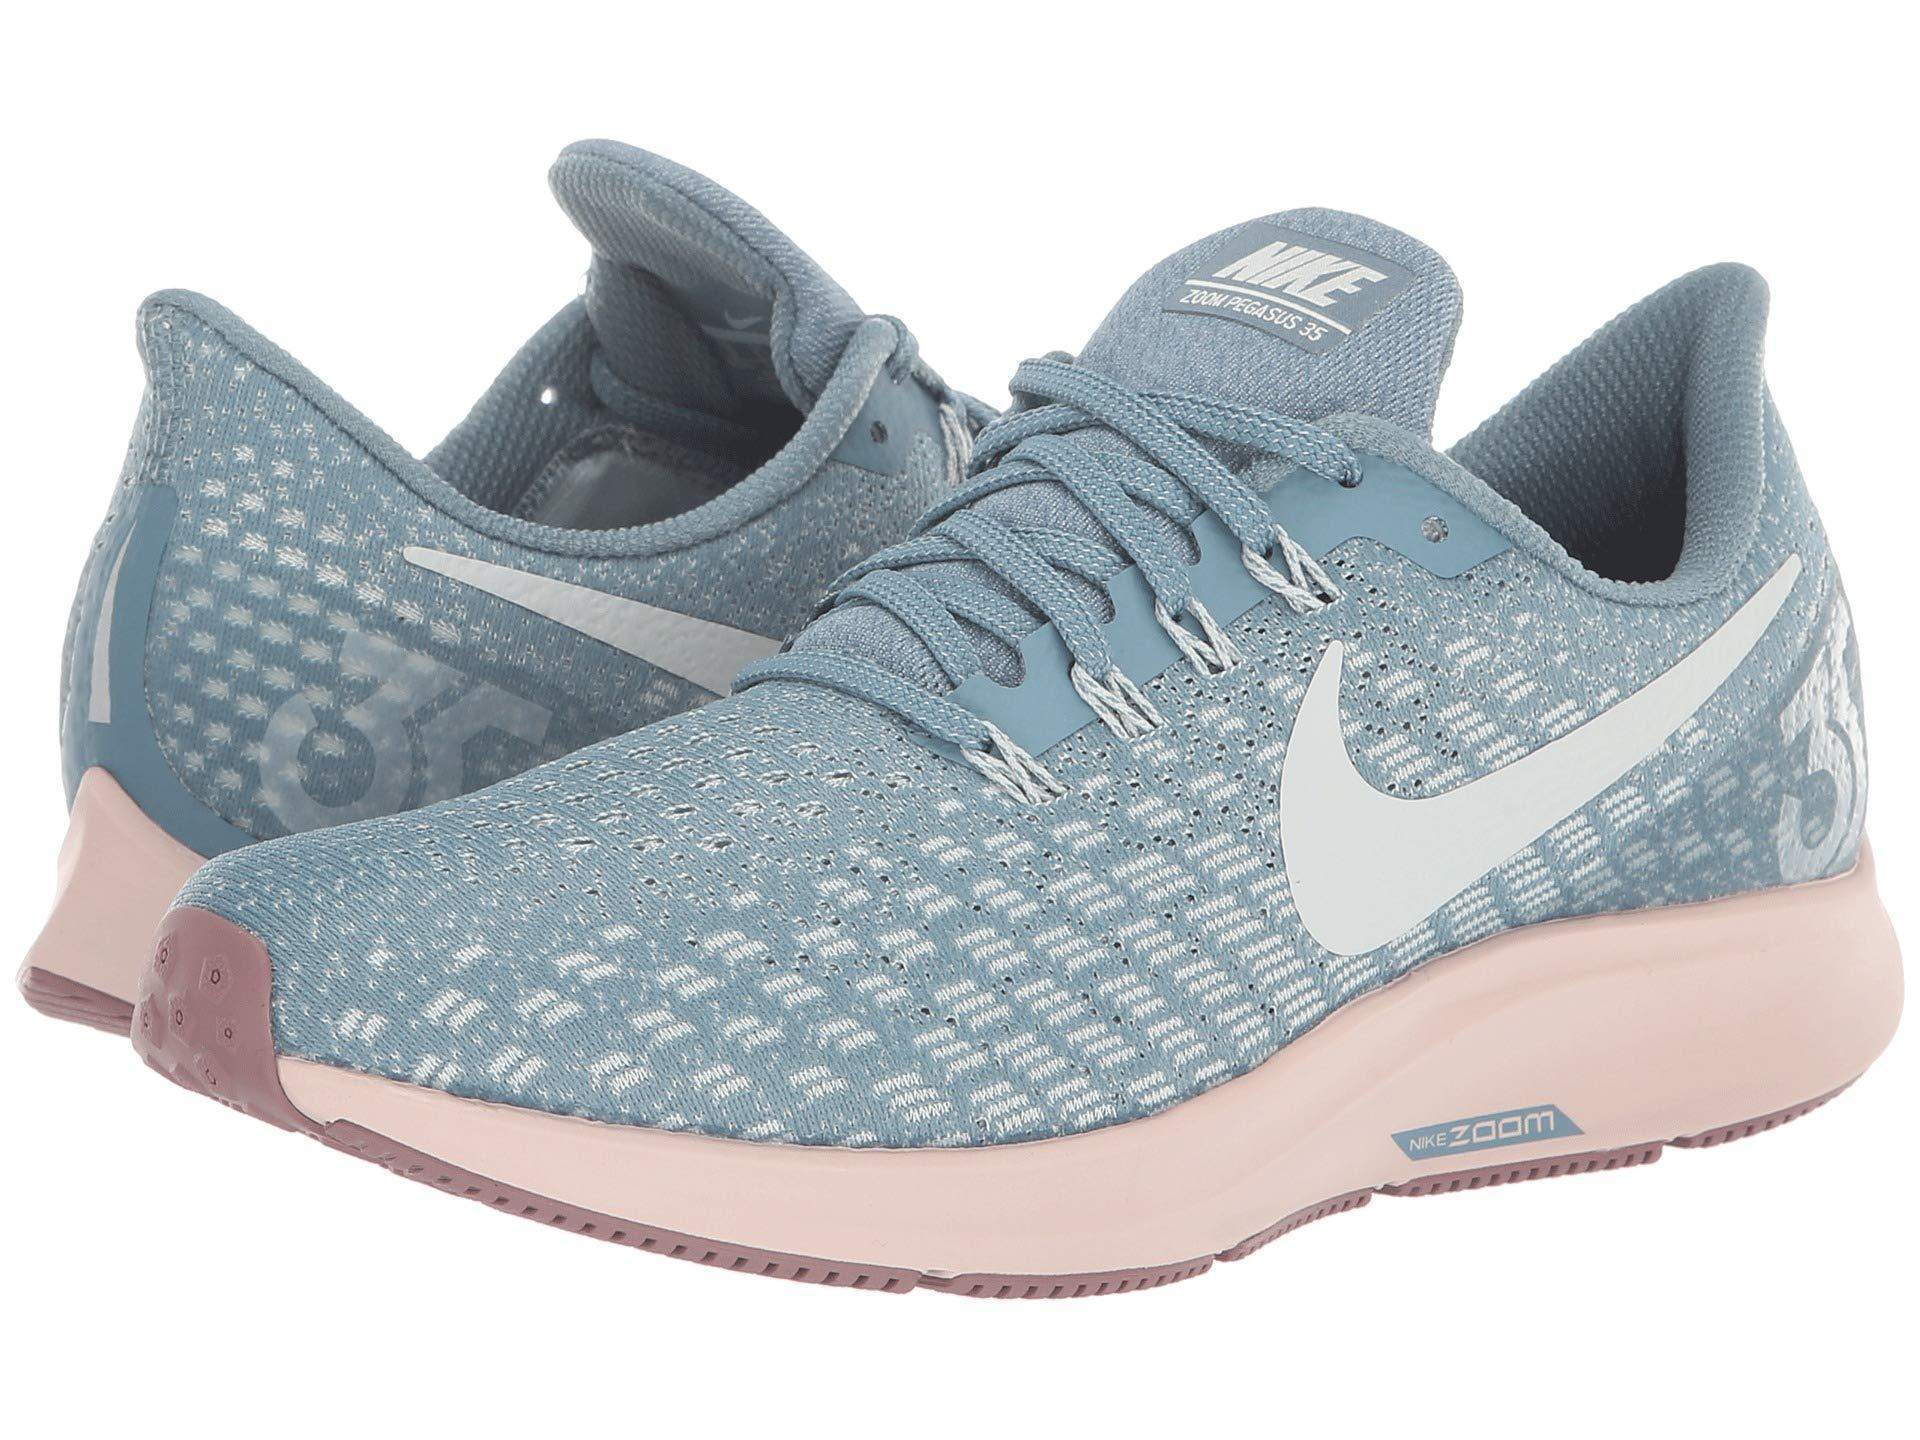 e729599d29c Lyst - Nike Air Zoom Pegasus 35 (vast Grey black pink Foam lime ...